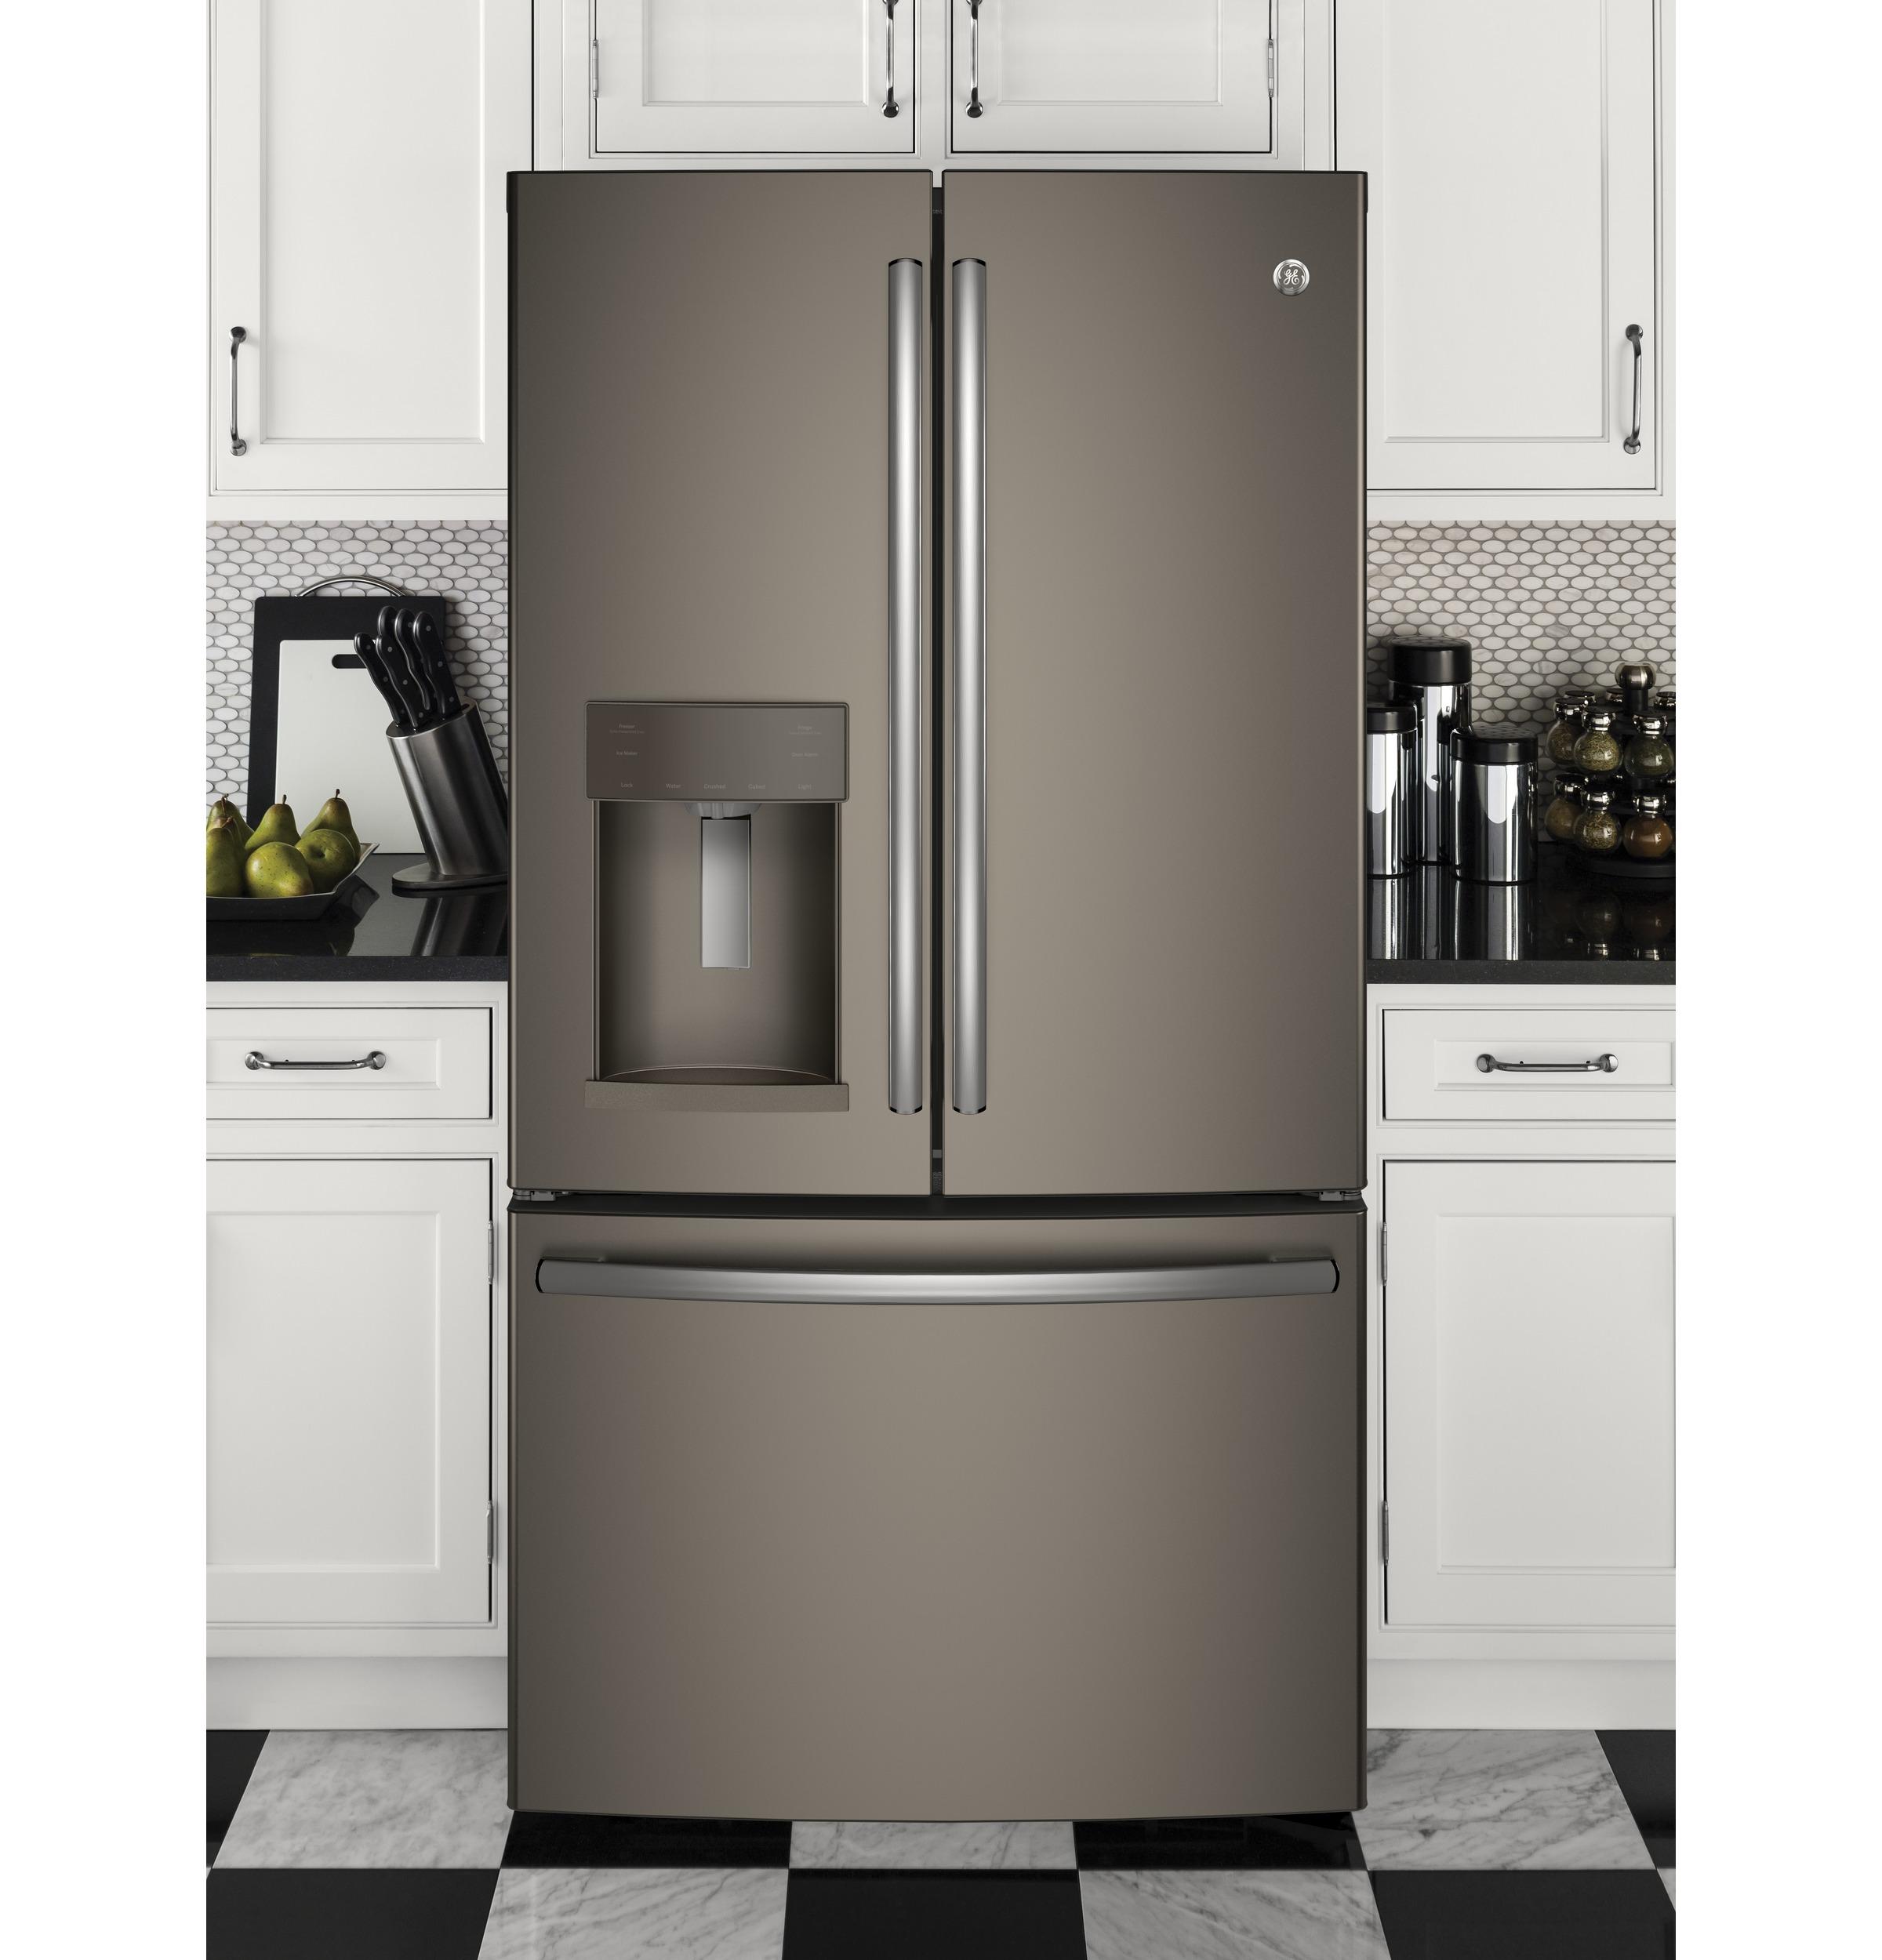 Model: GFE28GMKES   GE® ENERGY STAR® 27.8 Cu. Ft. French-Door Refrigerator